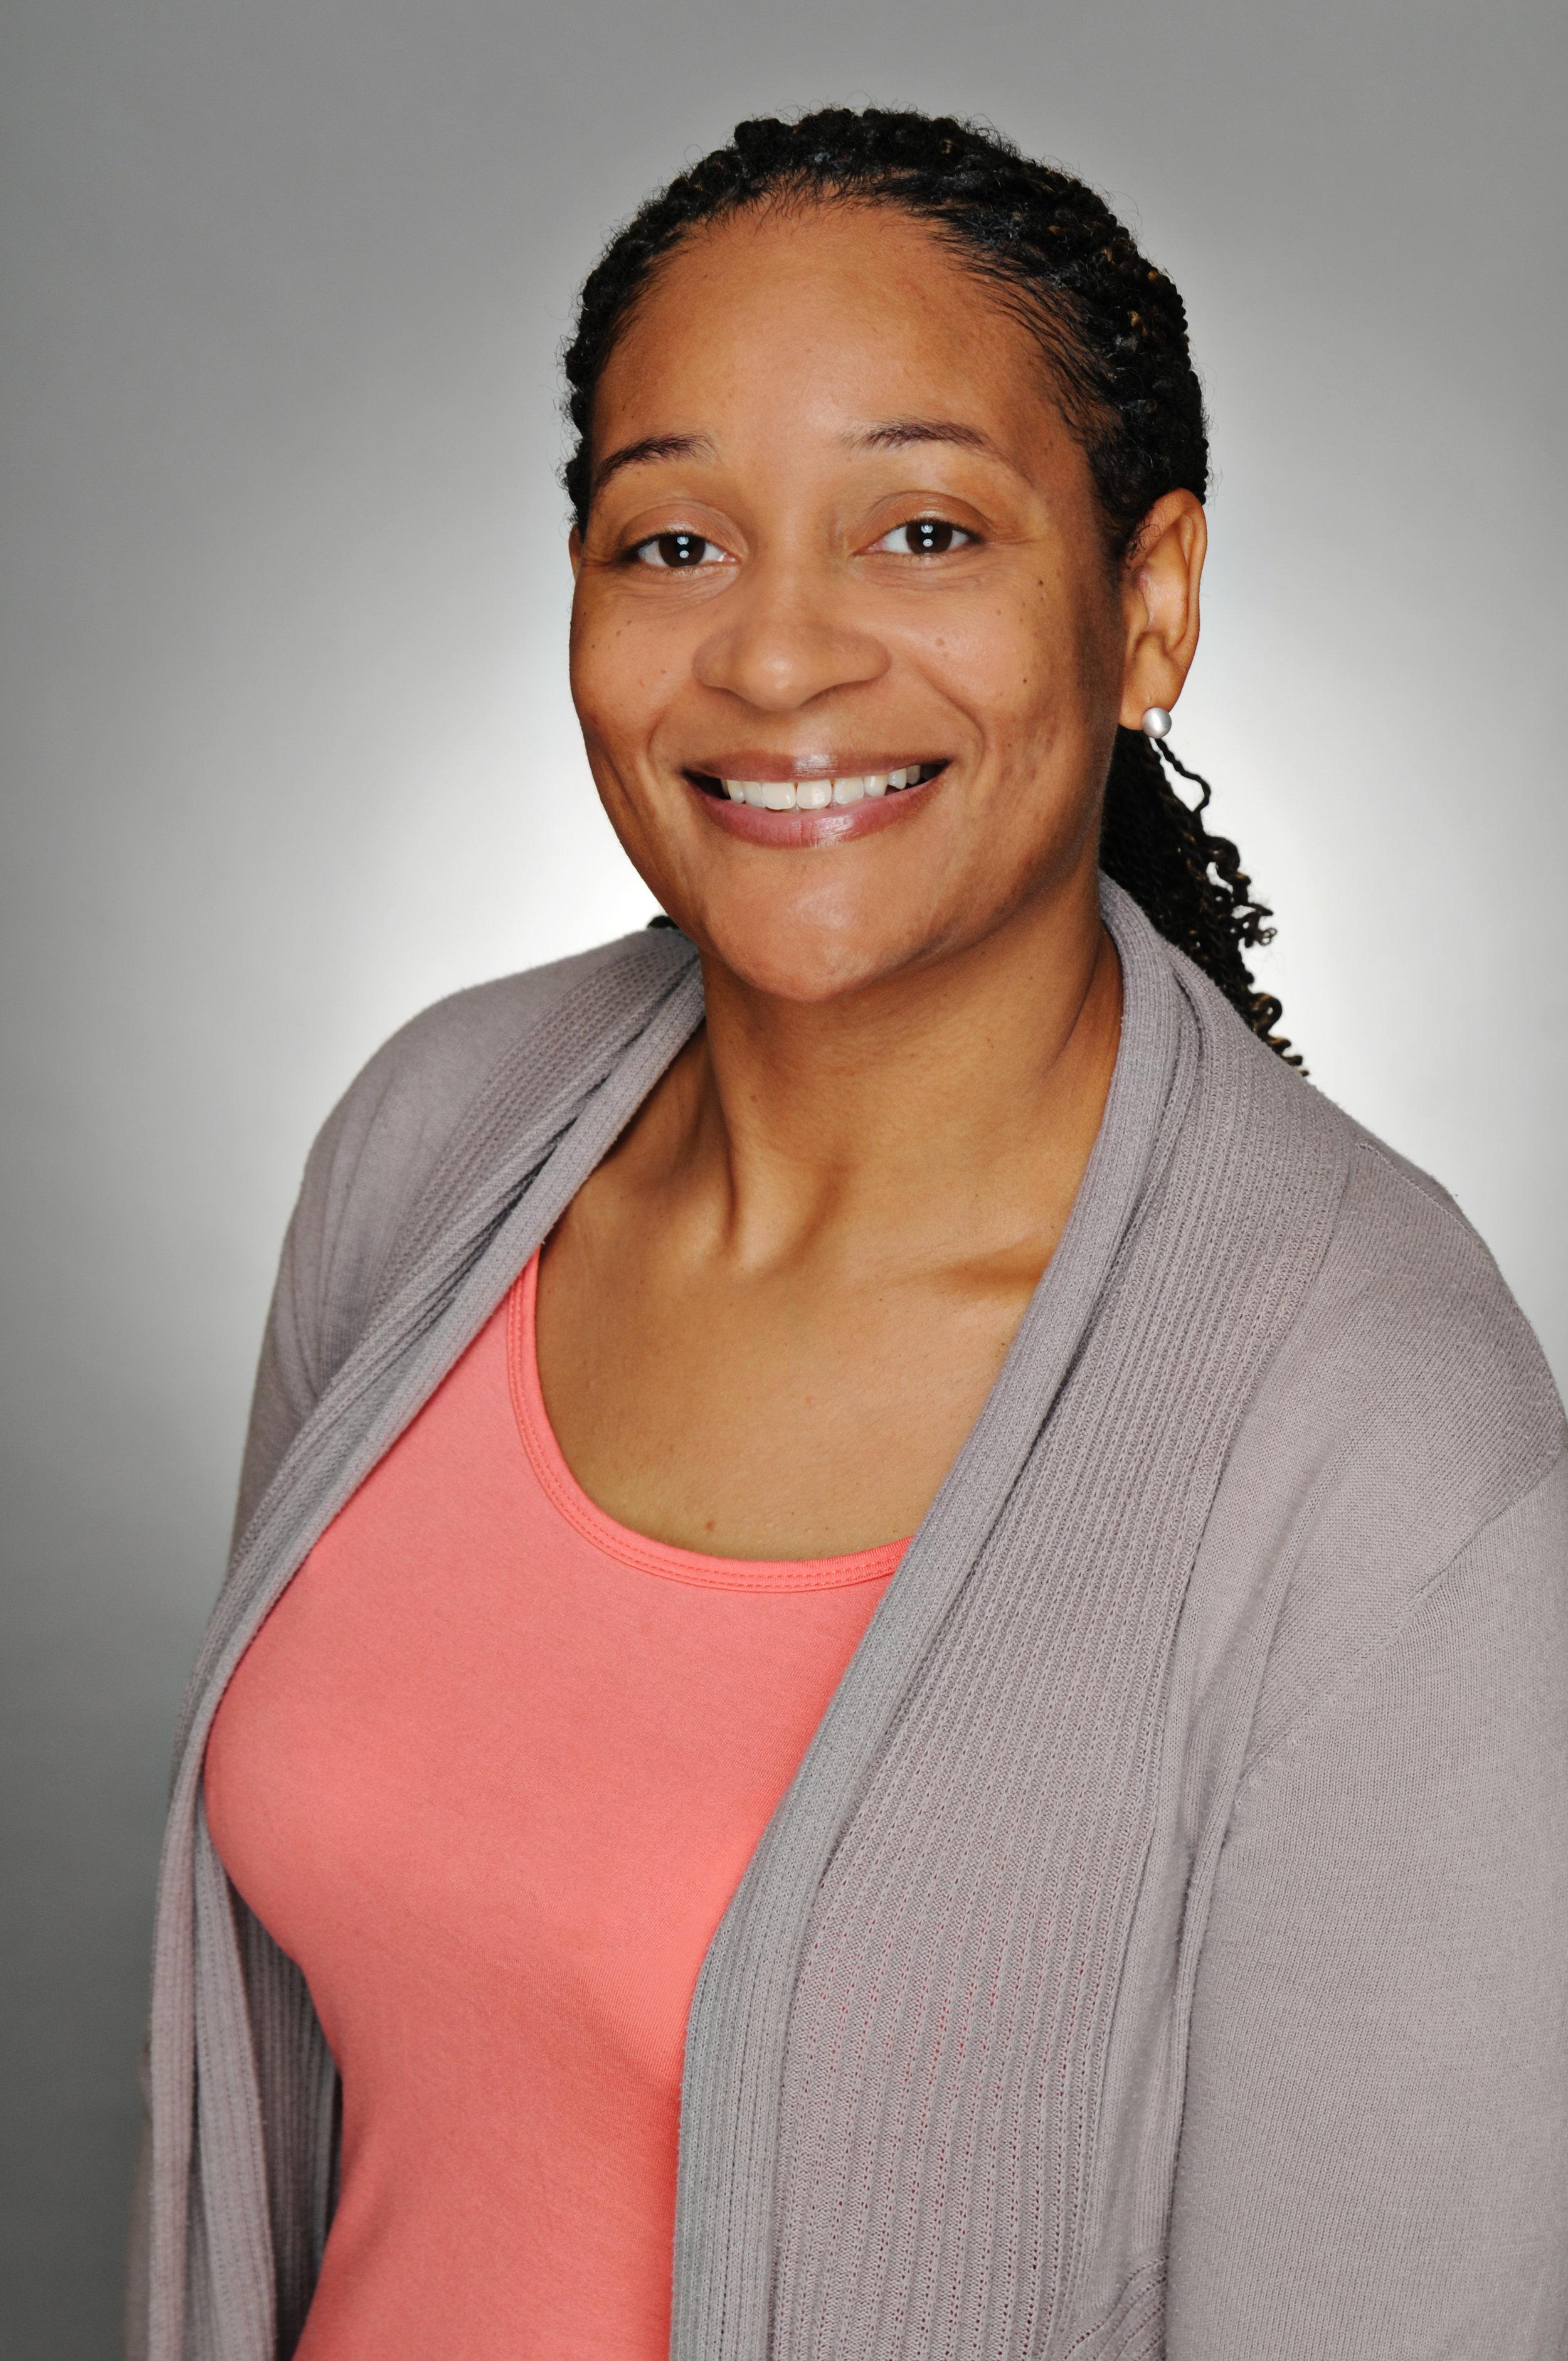 LaShika Taylor, BSHA/HM, RMA, Administrative Coordinator